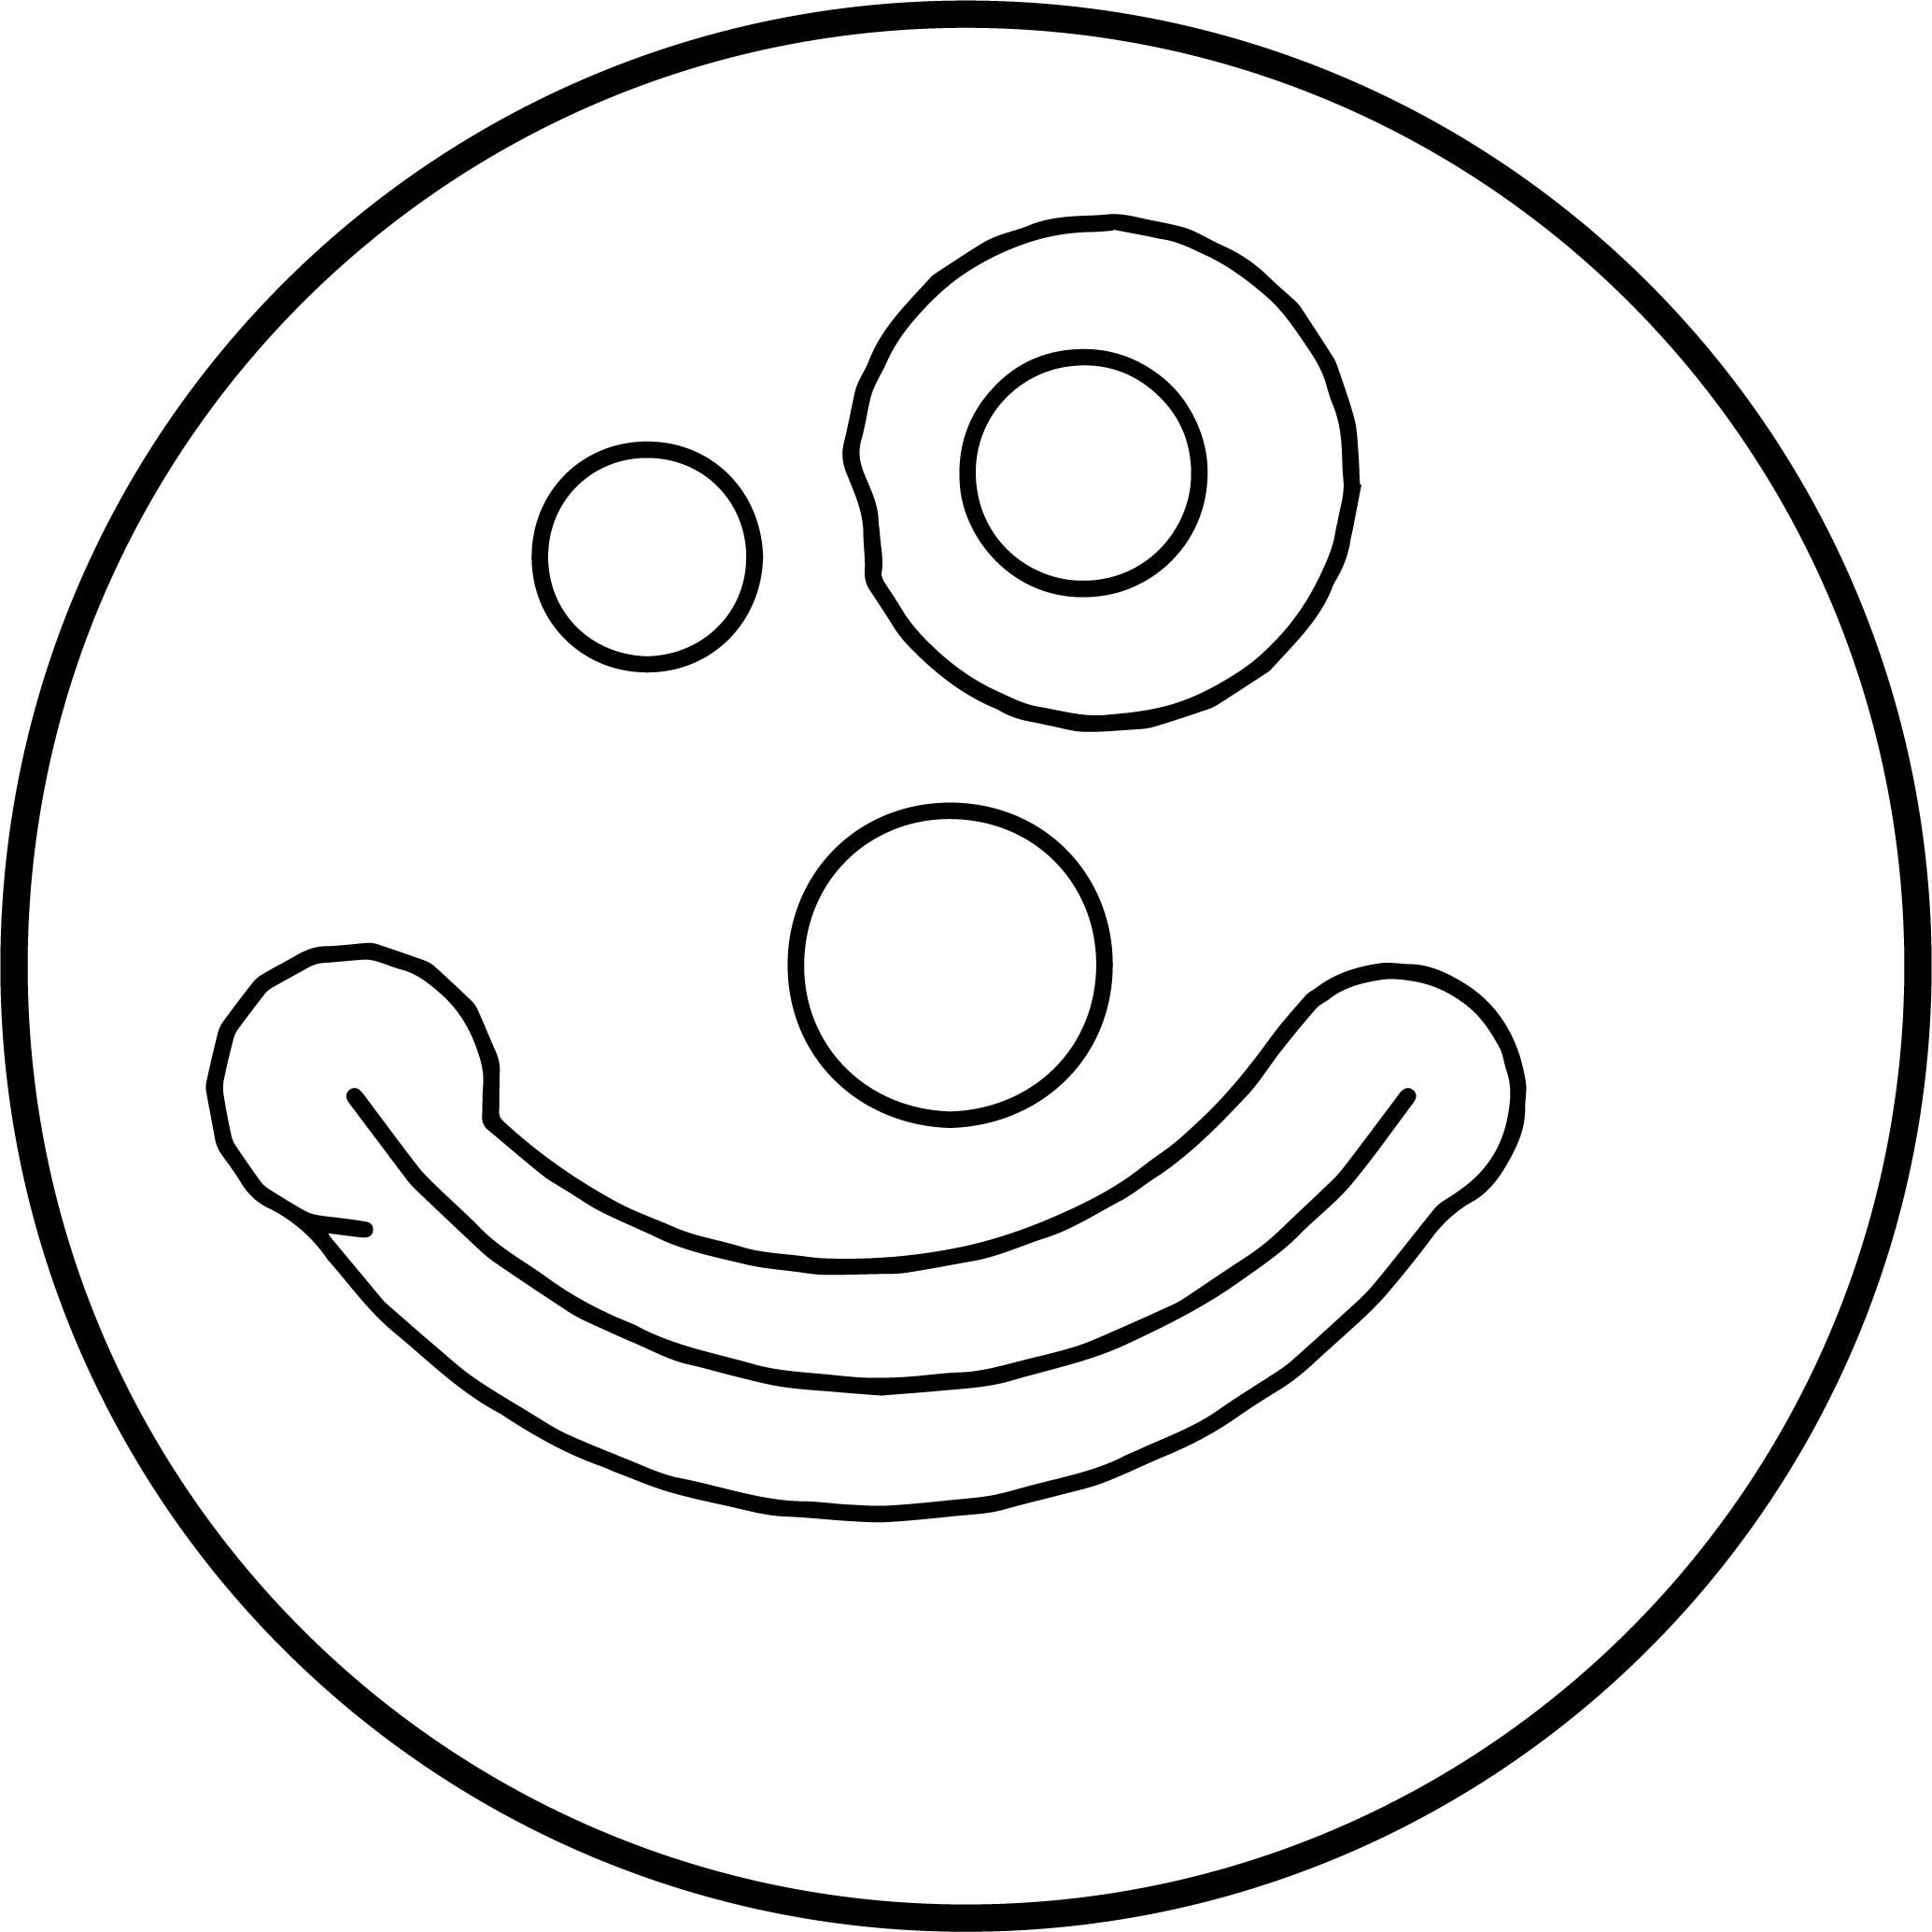 Cartoon Comic Clown Face Coloring Page